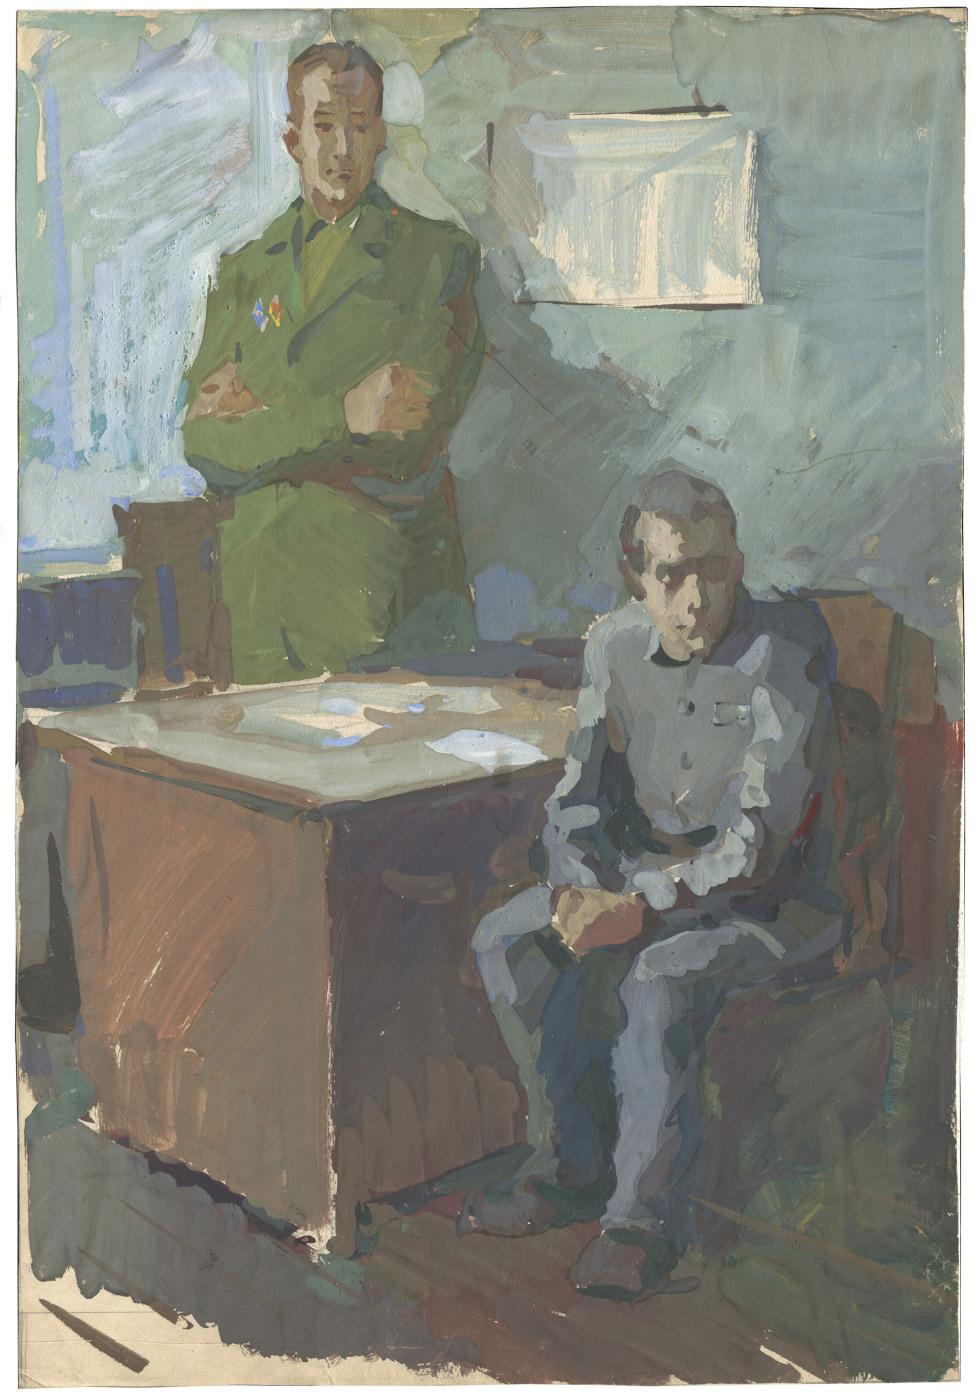 Alexandrovich Rudolf Pavlov. The conversation is zonal. 1974